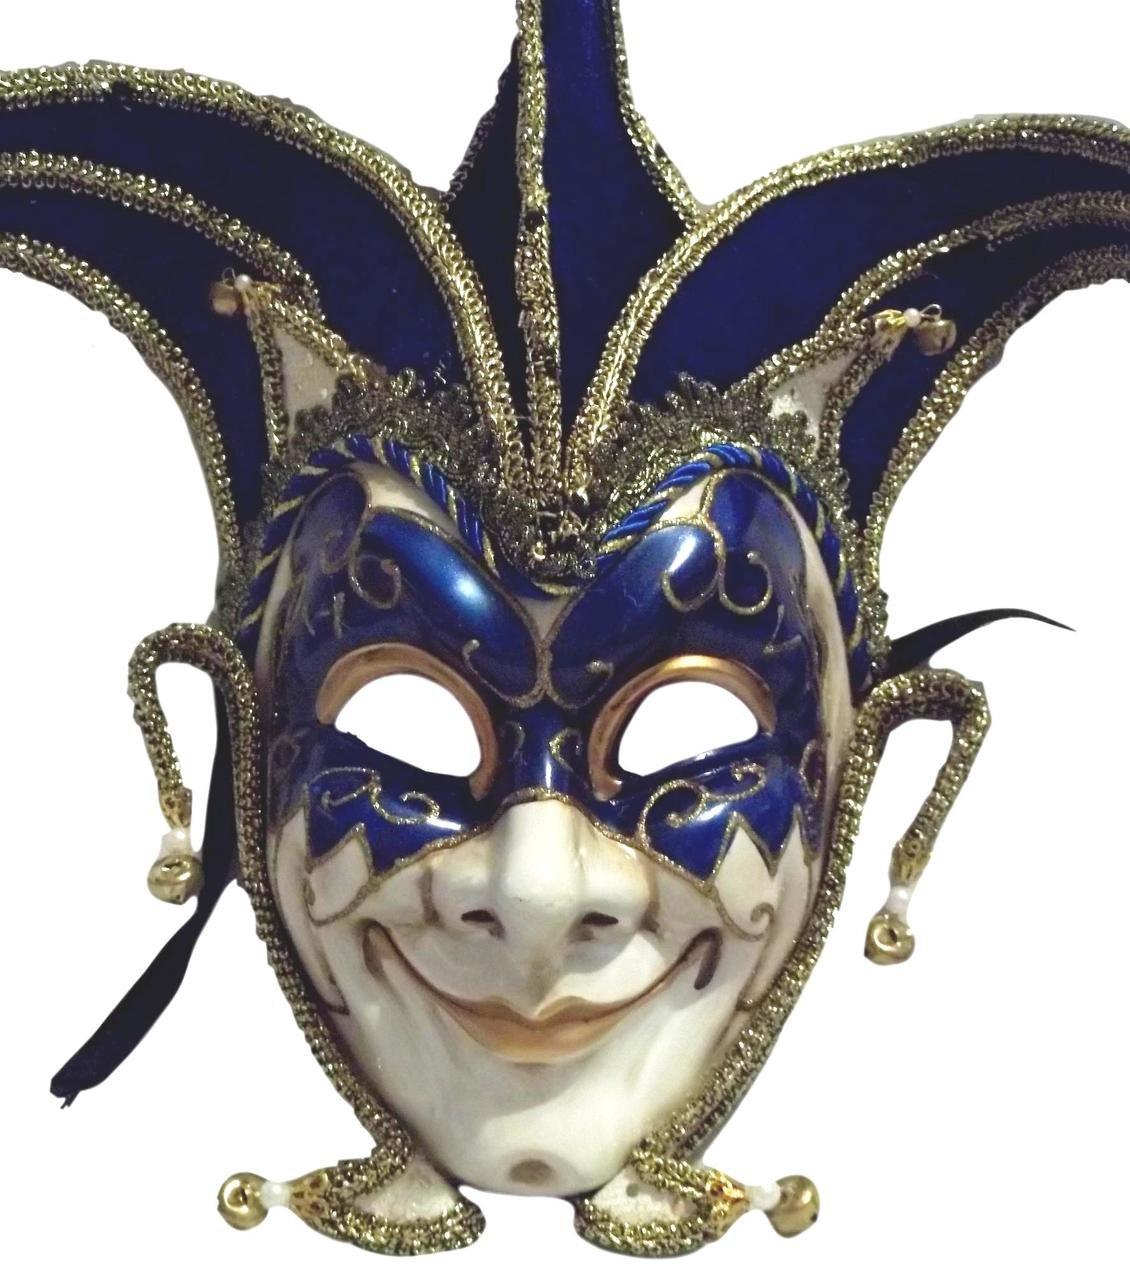 MGPS Jester Stick Mask Blue Decorate or Wear Mardi Gras Masquerade Mask Wall Hanging